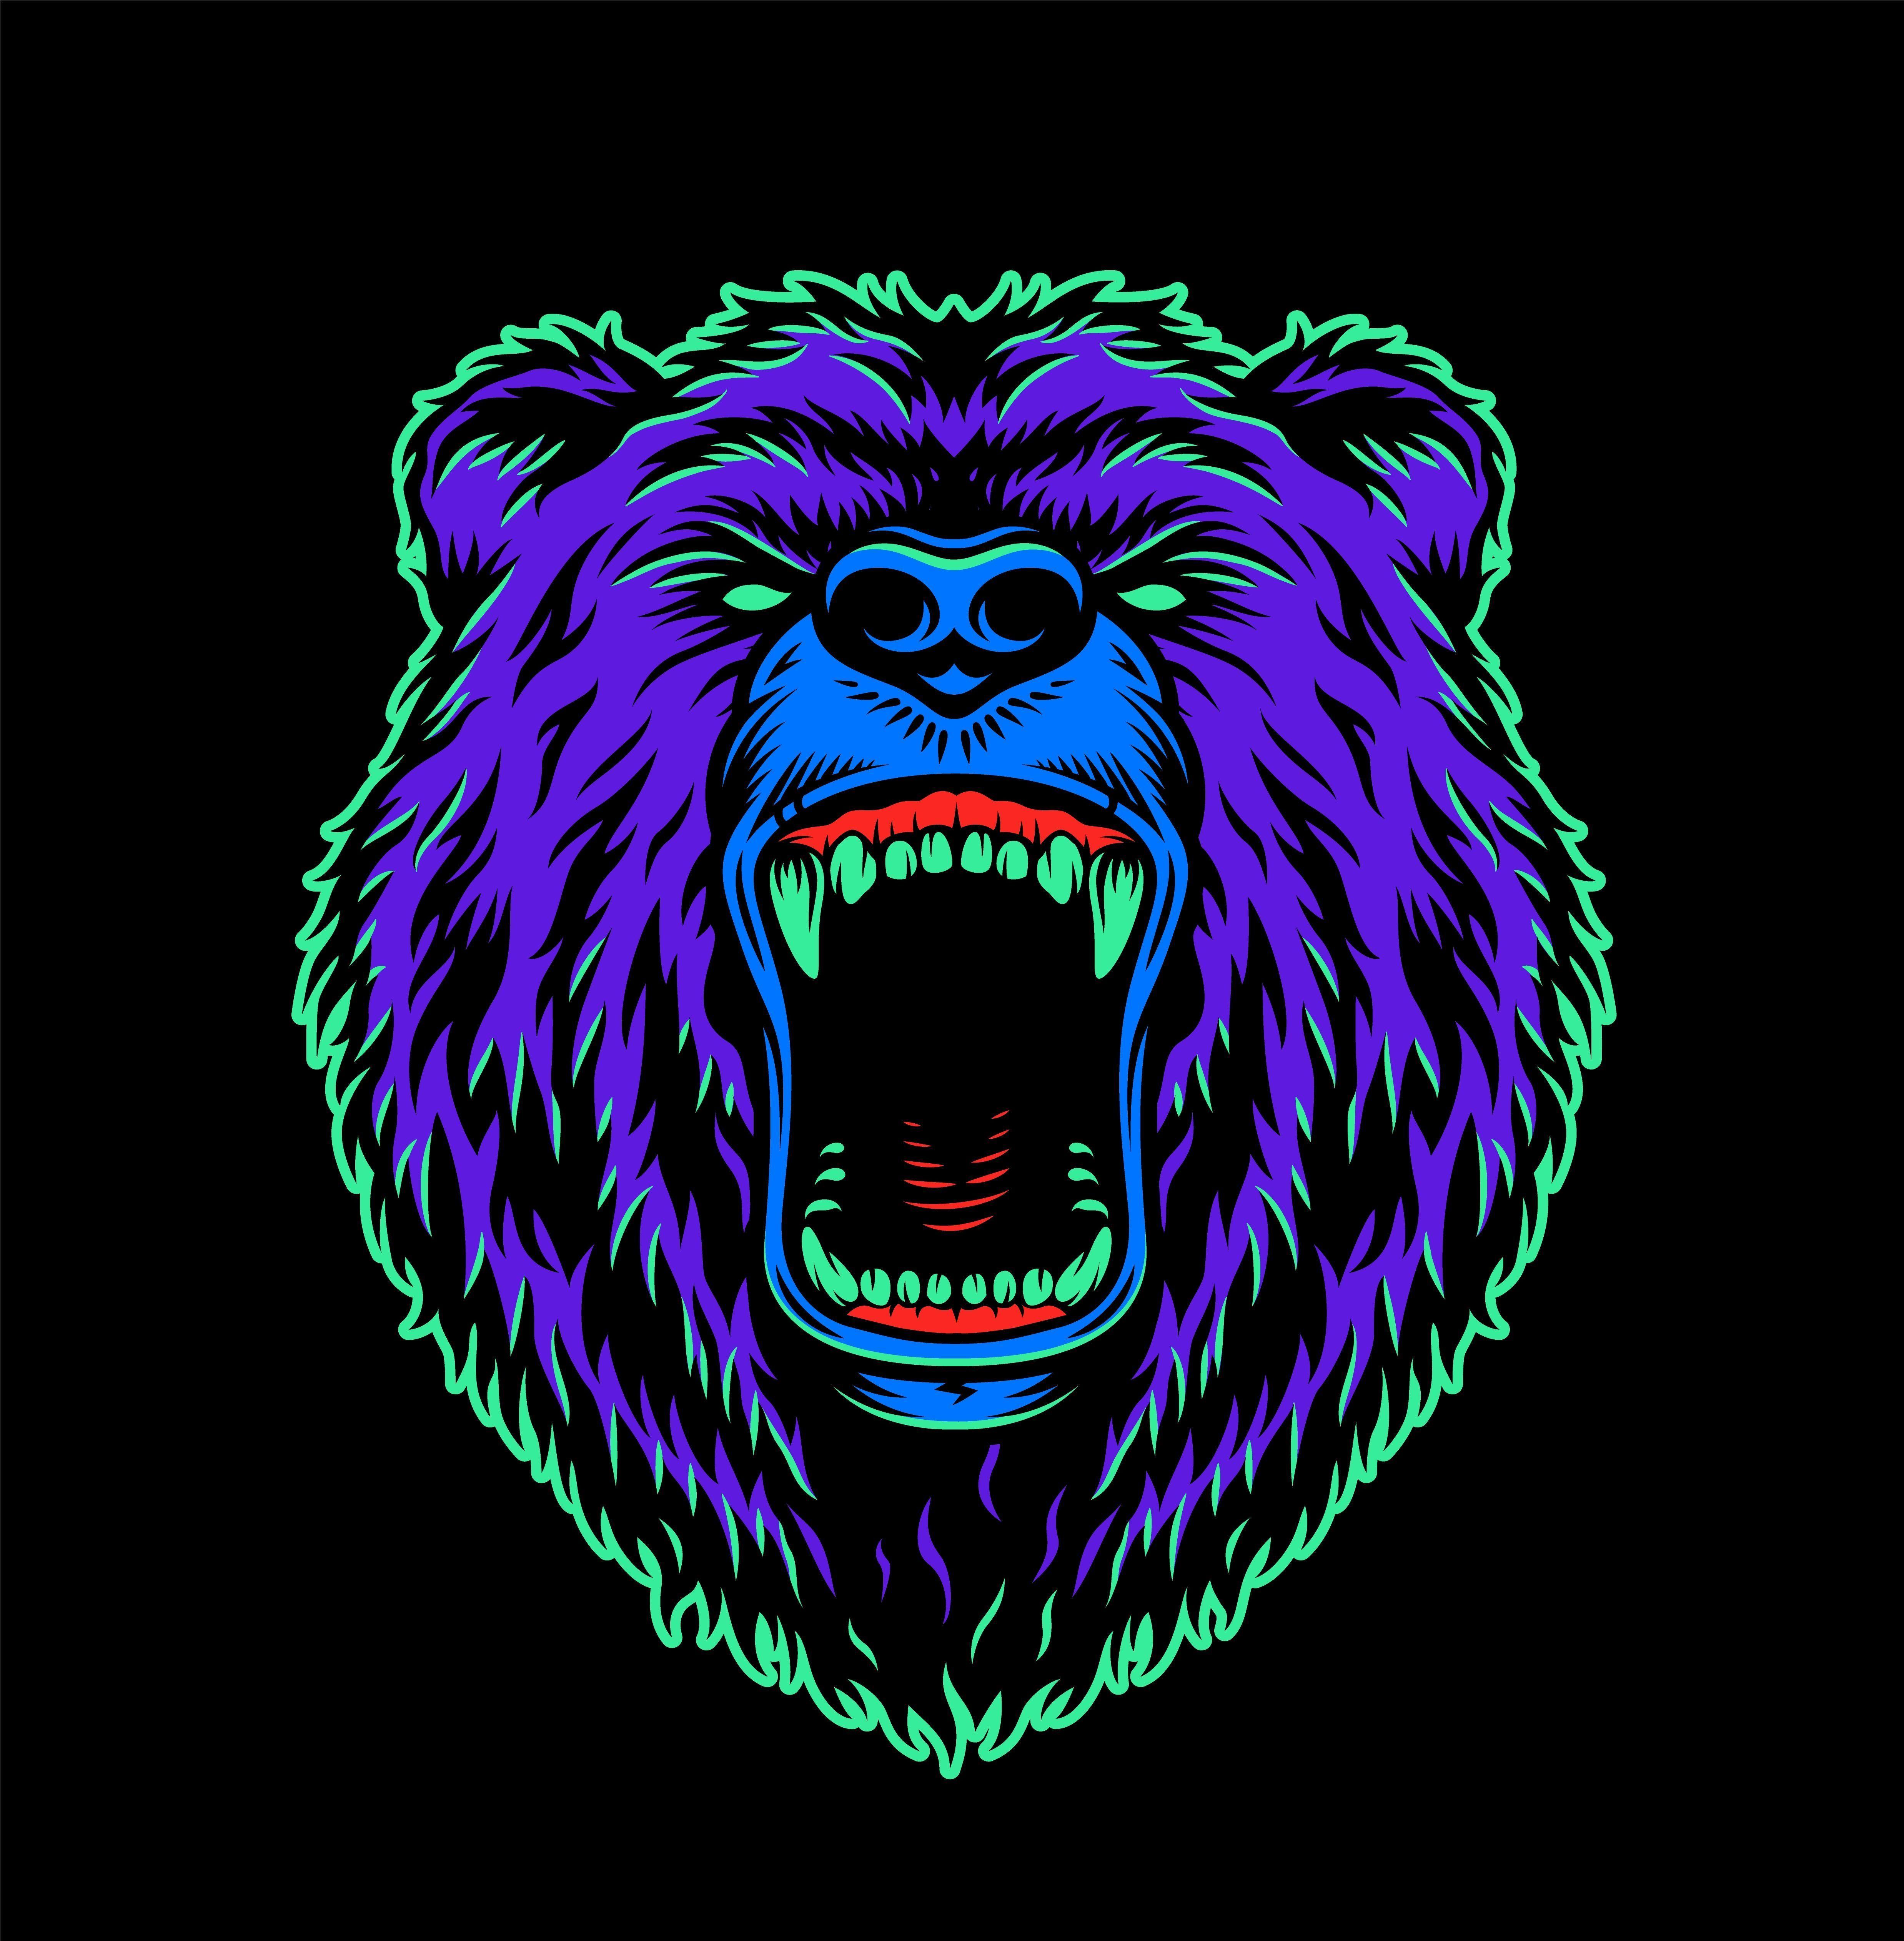 Vintage Cruel Animals Set In 2020 Bear Illustration Mascot Design Animal Heads